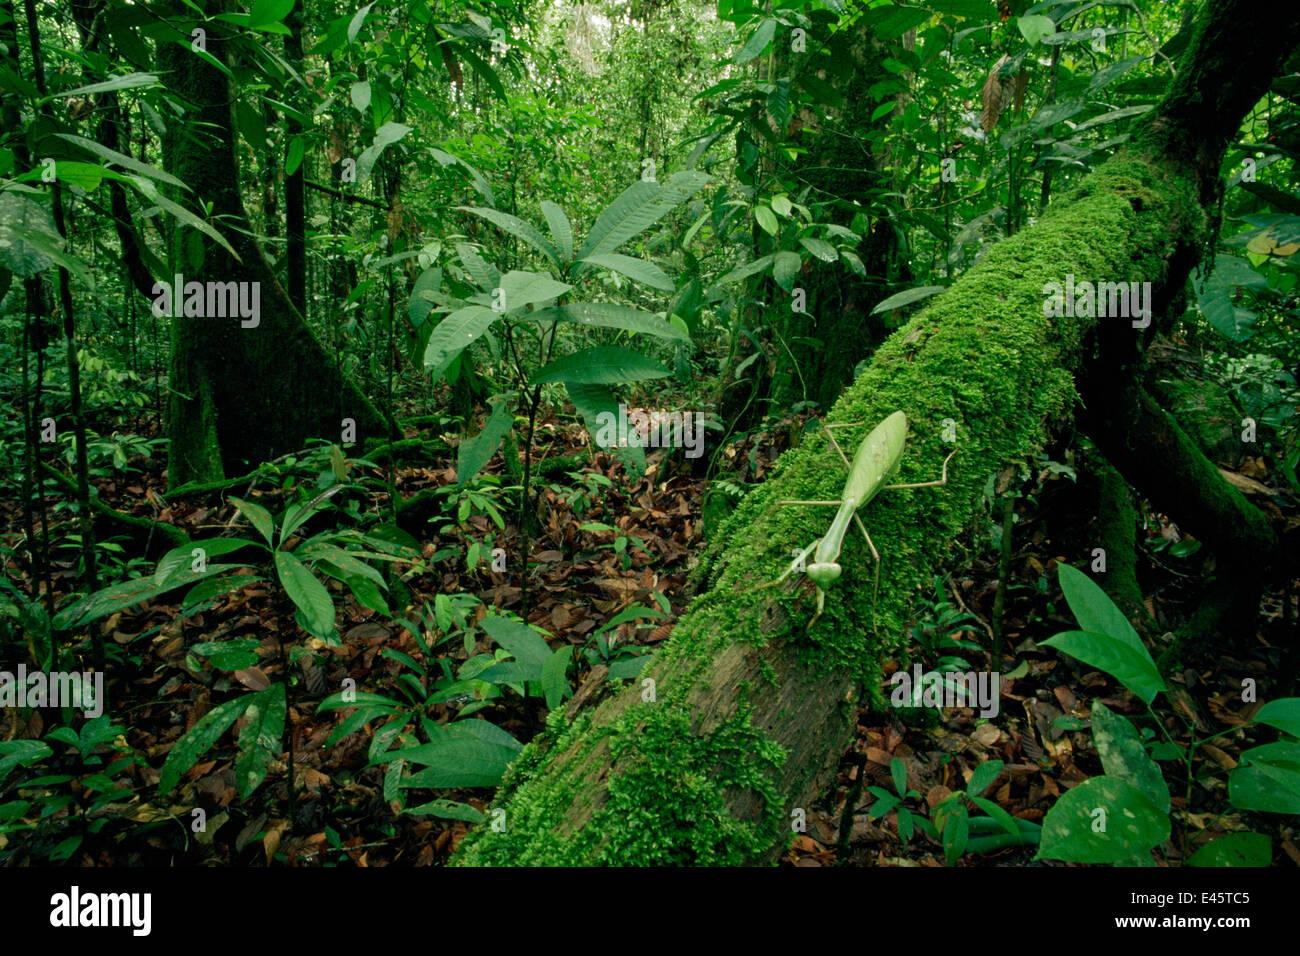 Praying mantis (Mantodea) green leaf mimic type walking along a mossy branch in lowland rainforest, Gunung Palung - Stock Image